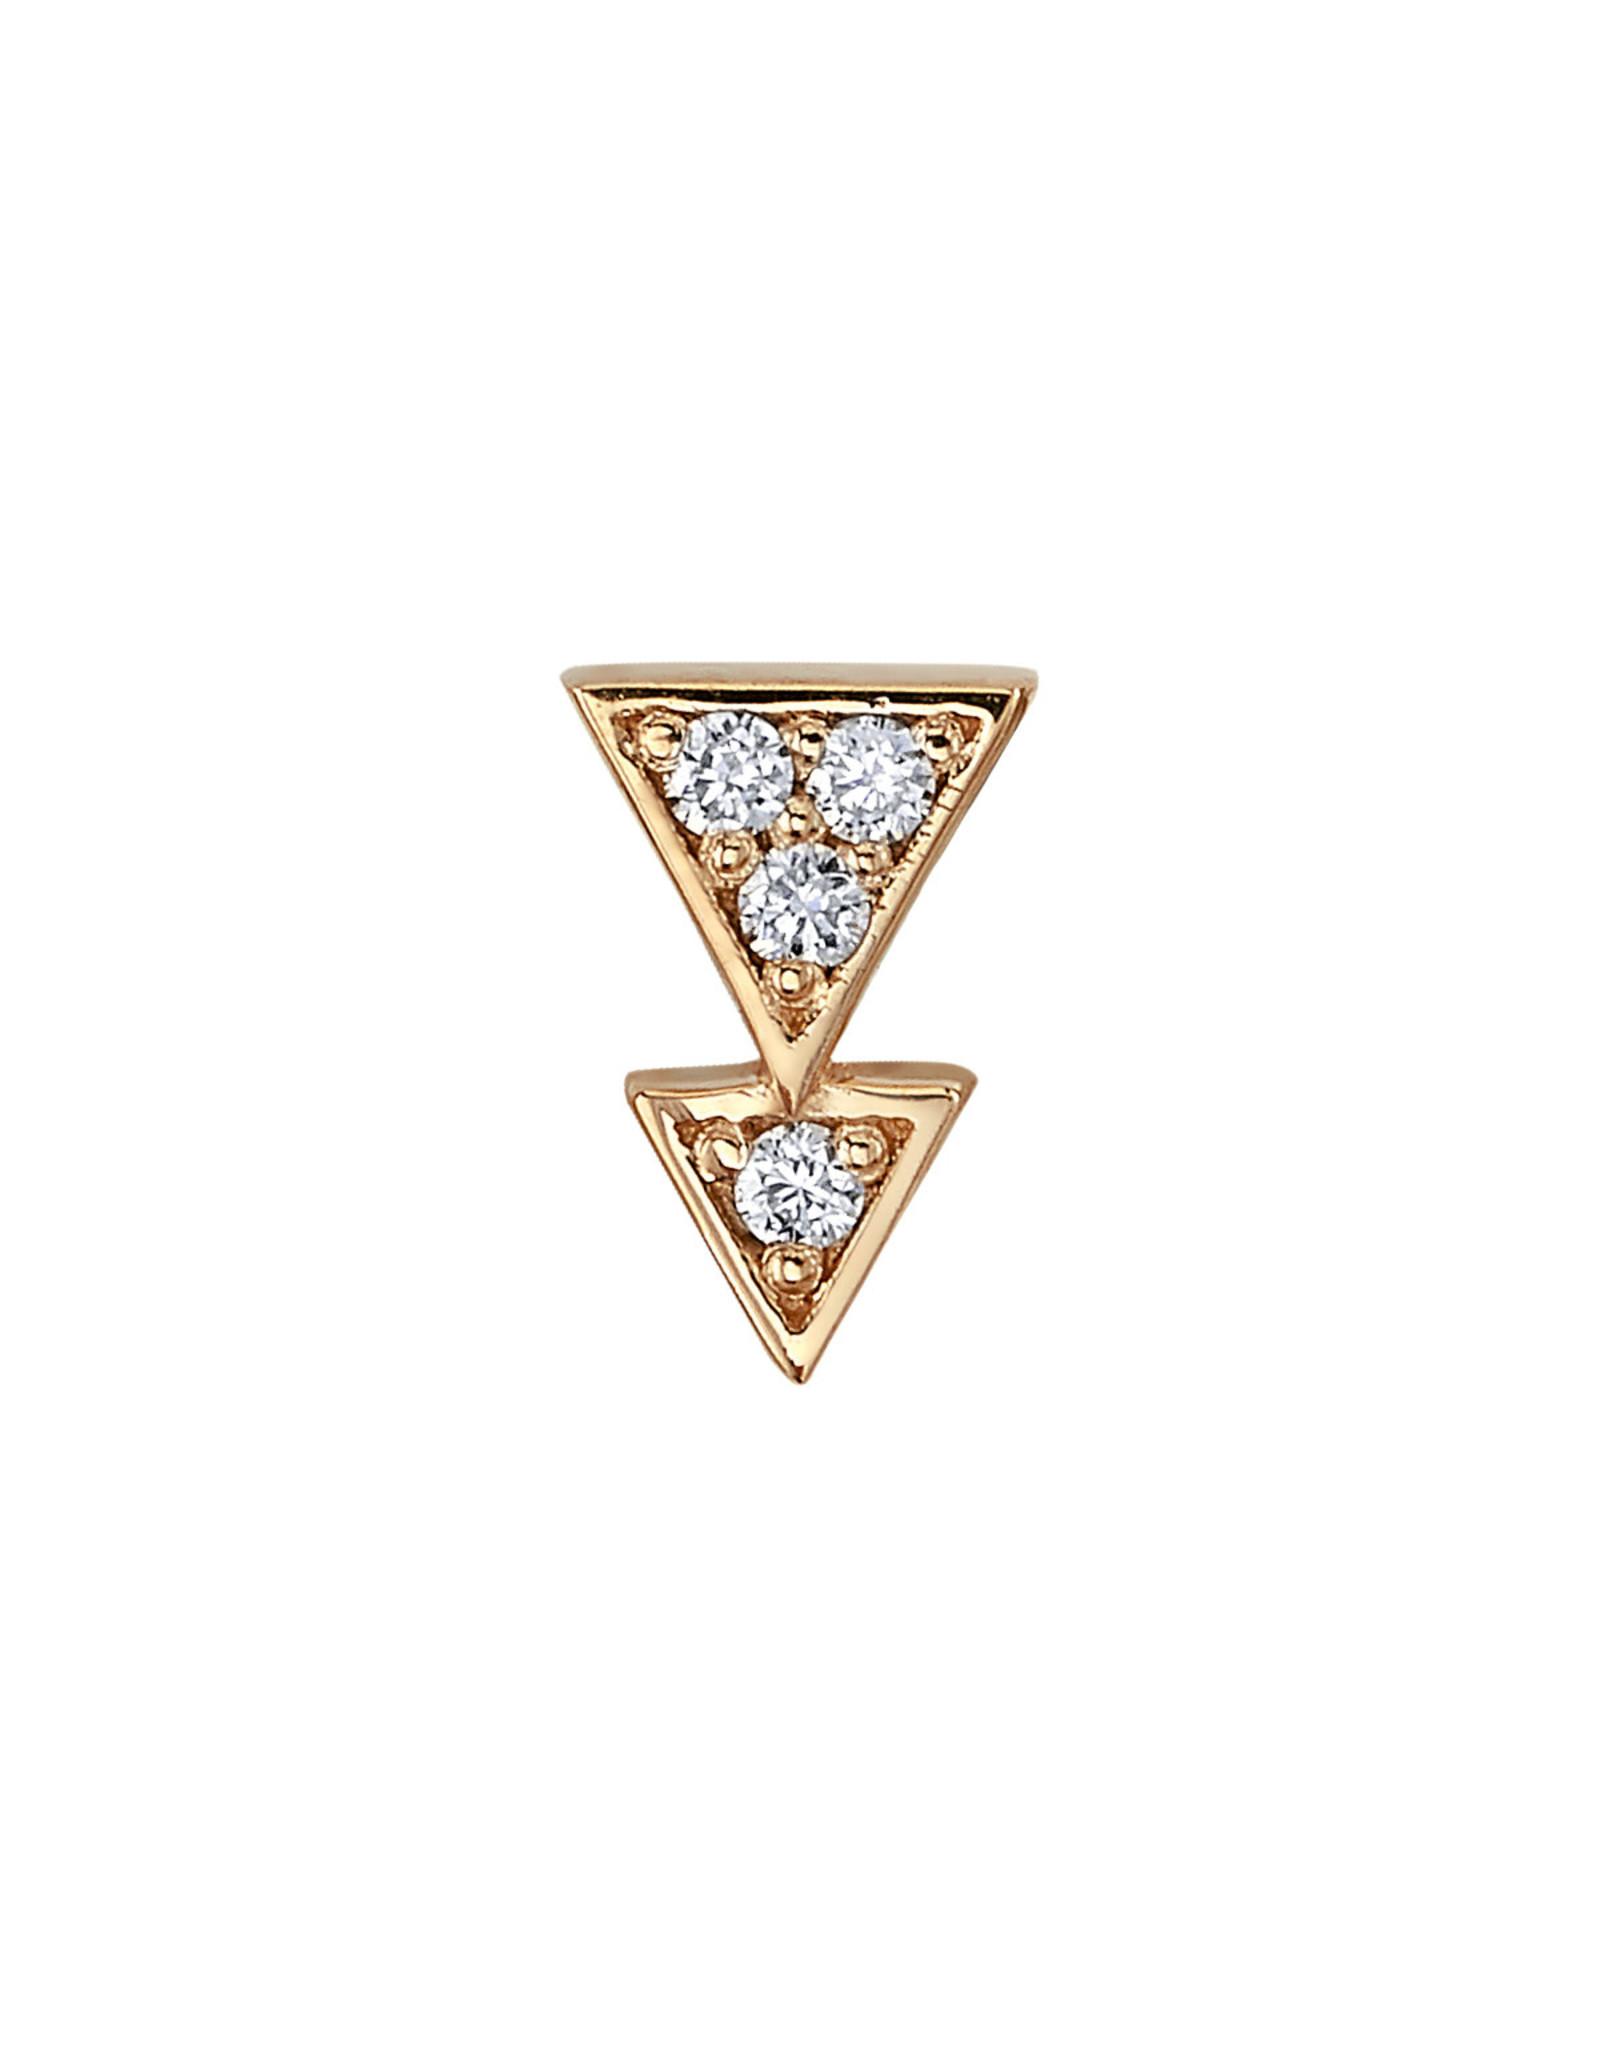 "BVLA BVLA ""Fate"" press fit end with 4x 1.0 VS1 diamonds"